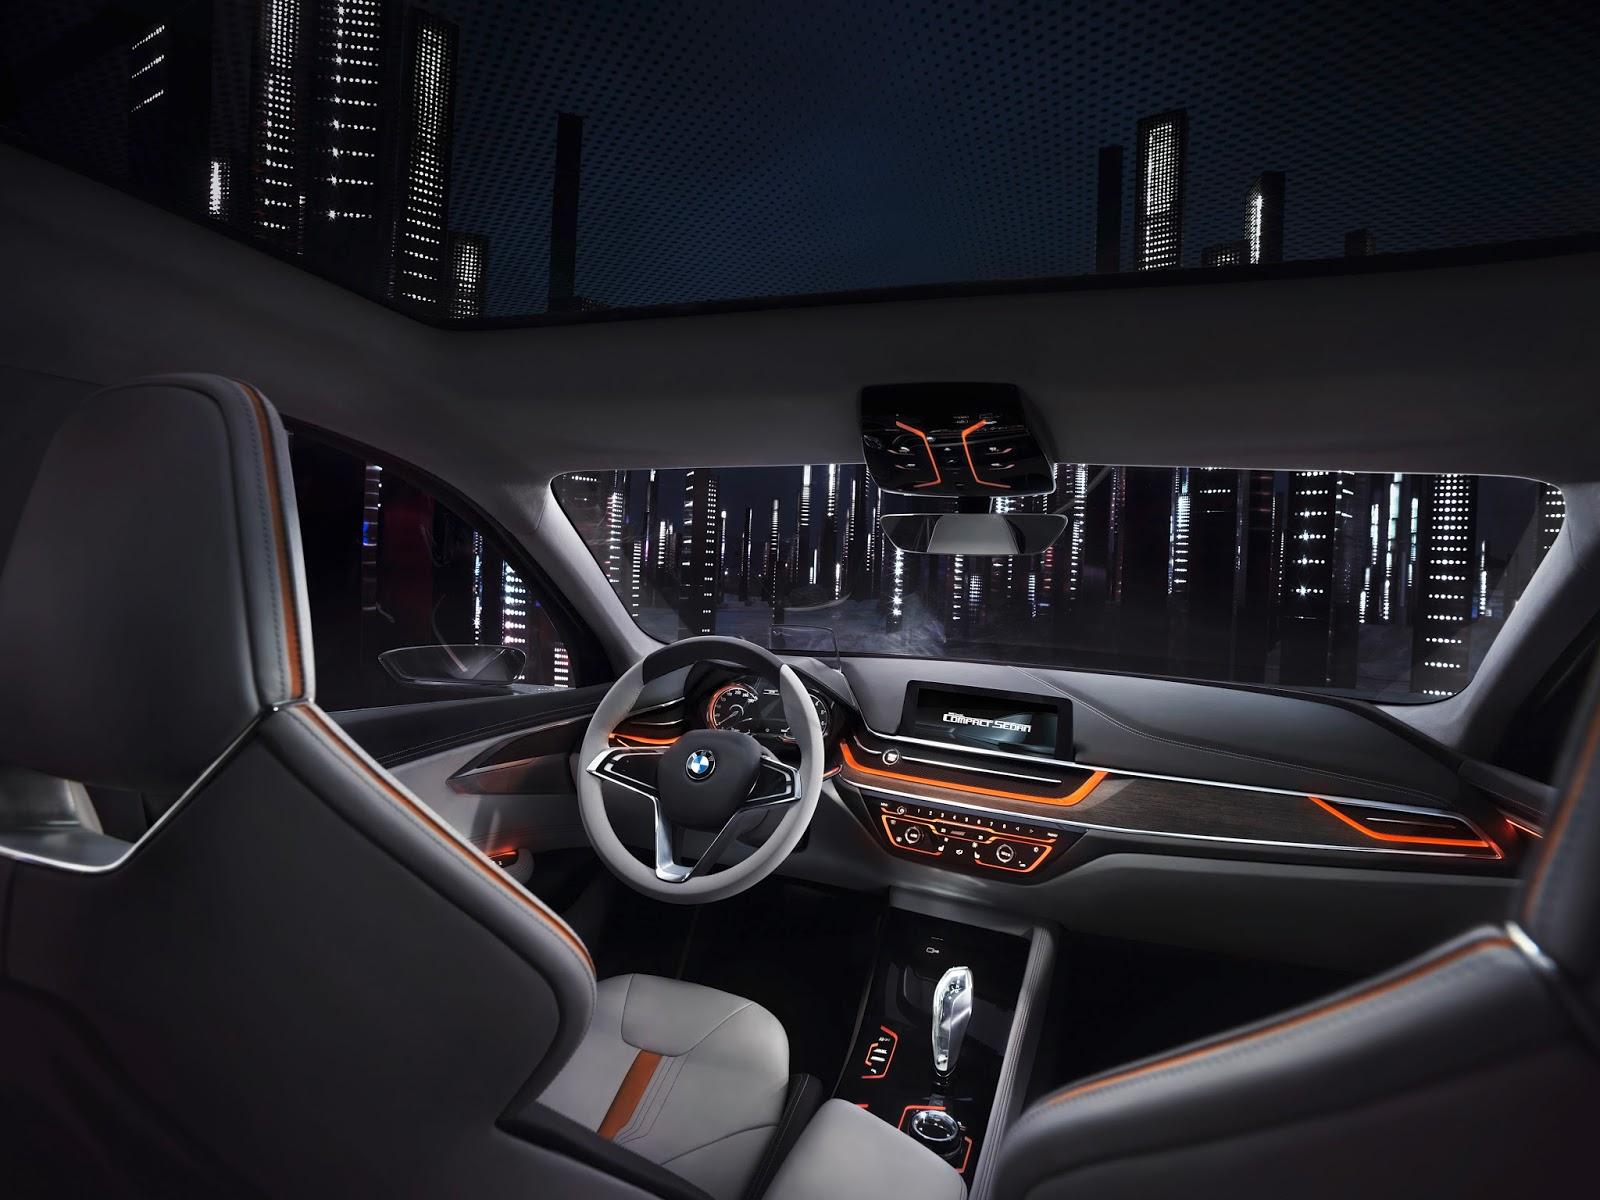 P90204809 highRes BMW Concept Compact sedan ή μήπως σειρά 1 sedan; BMW, BMW Concept